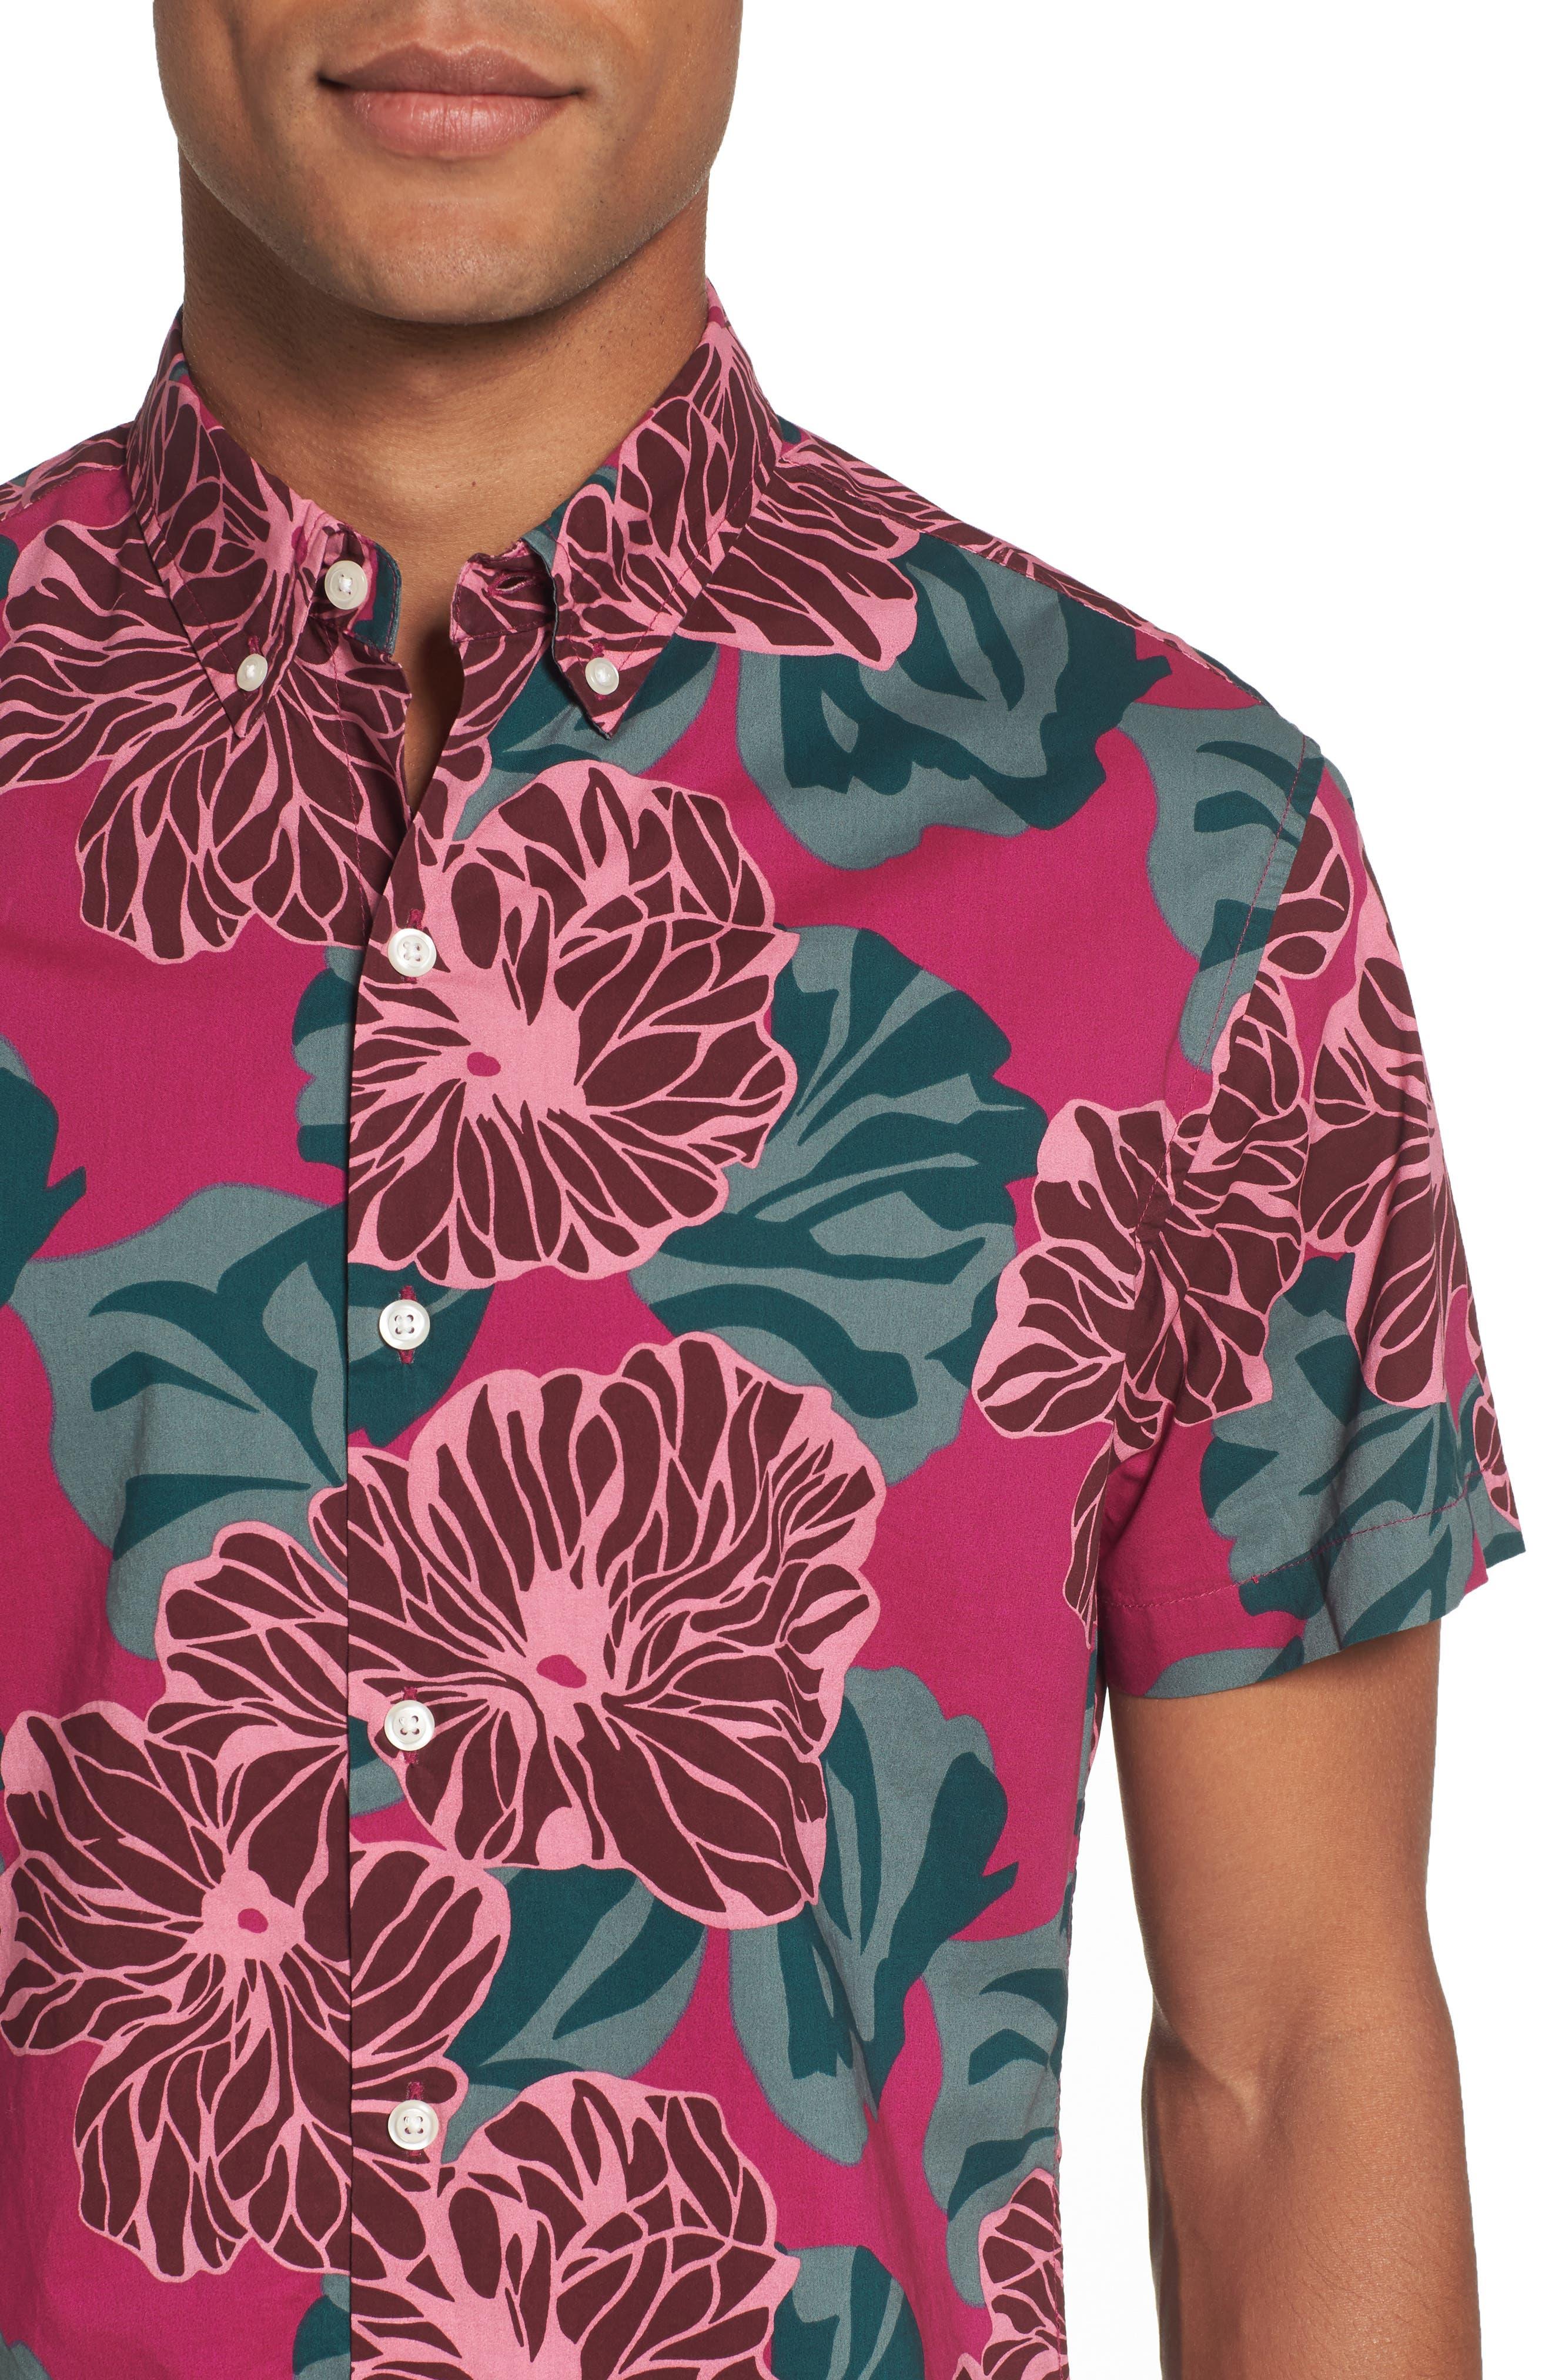 Riviera Slim Fit Short Sleeve Sport Shirt,                             Alternate thumbnail 4, color,                             650